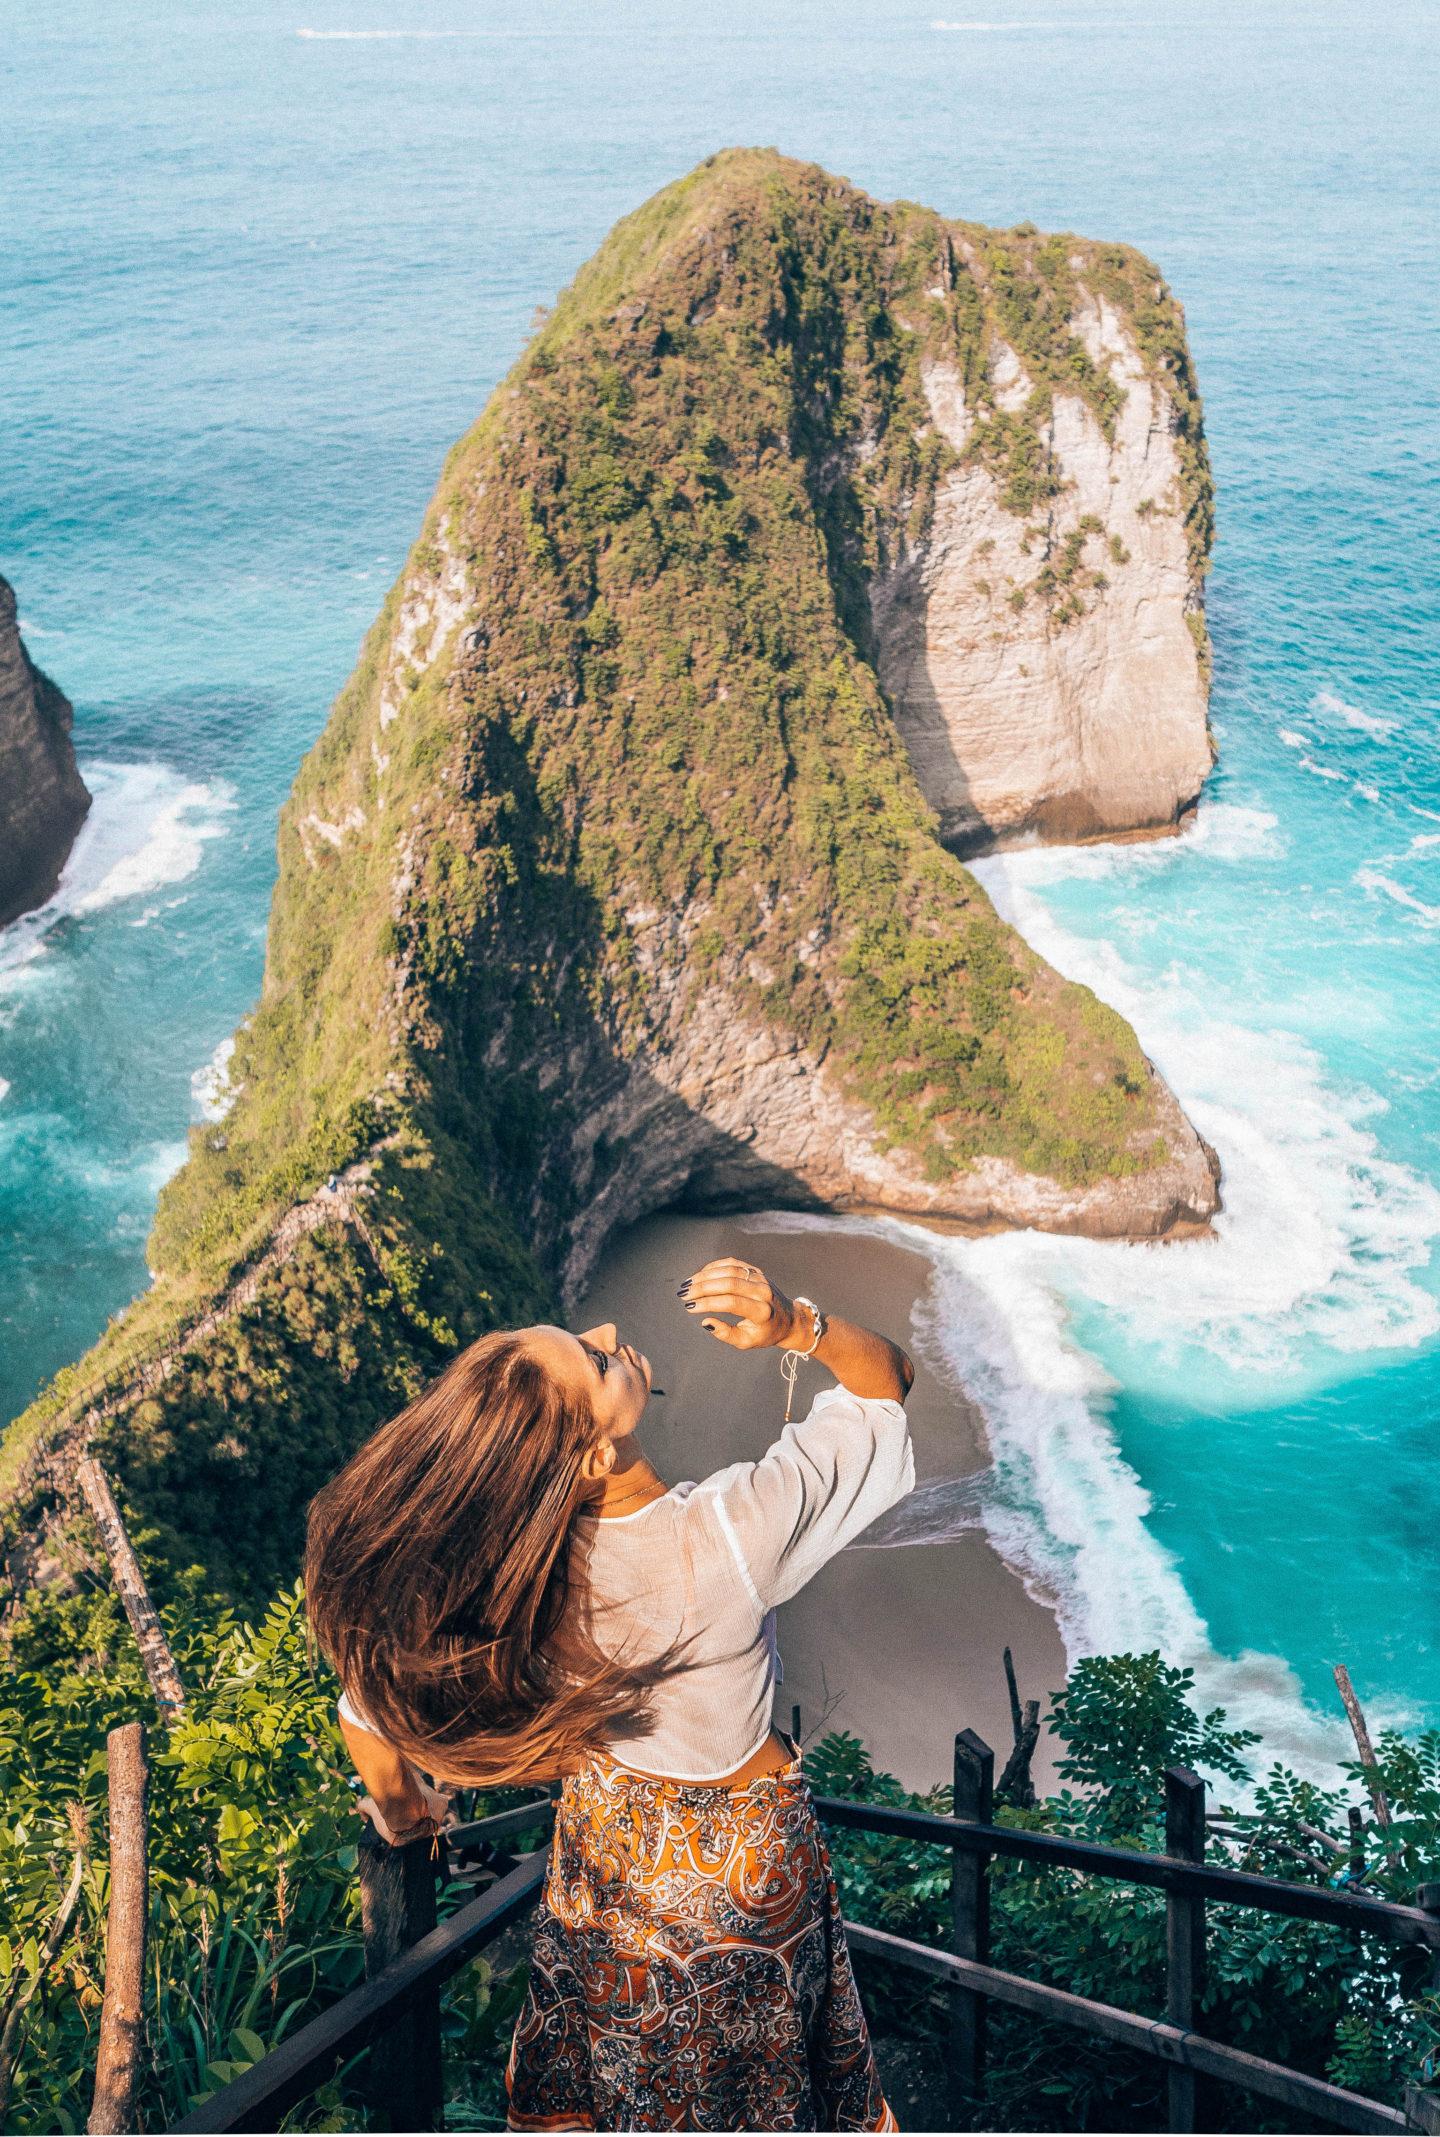 kelingking beach bali nusa penida dinosaur beach brunettie travelling trip